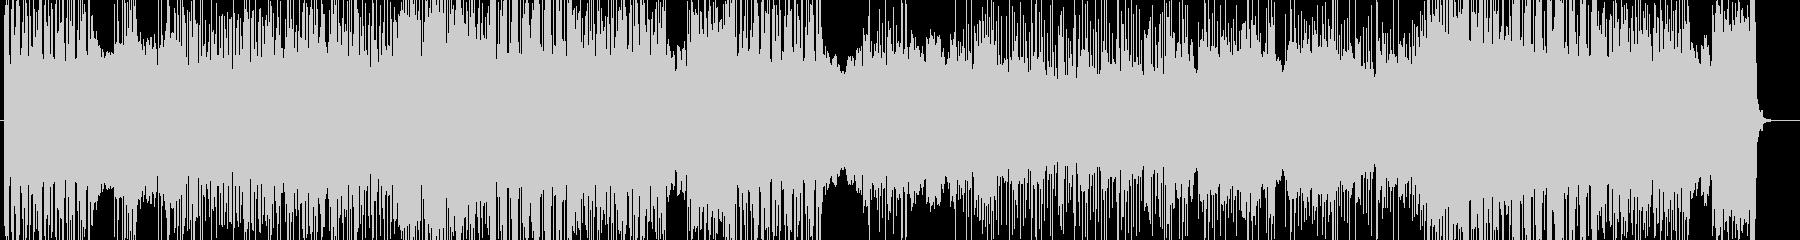 「HR/HM」「DARK」BGM212の未再生の波形